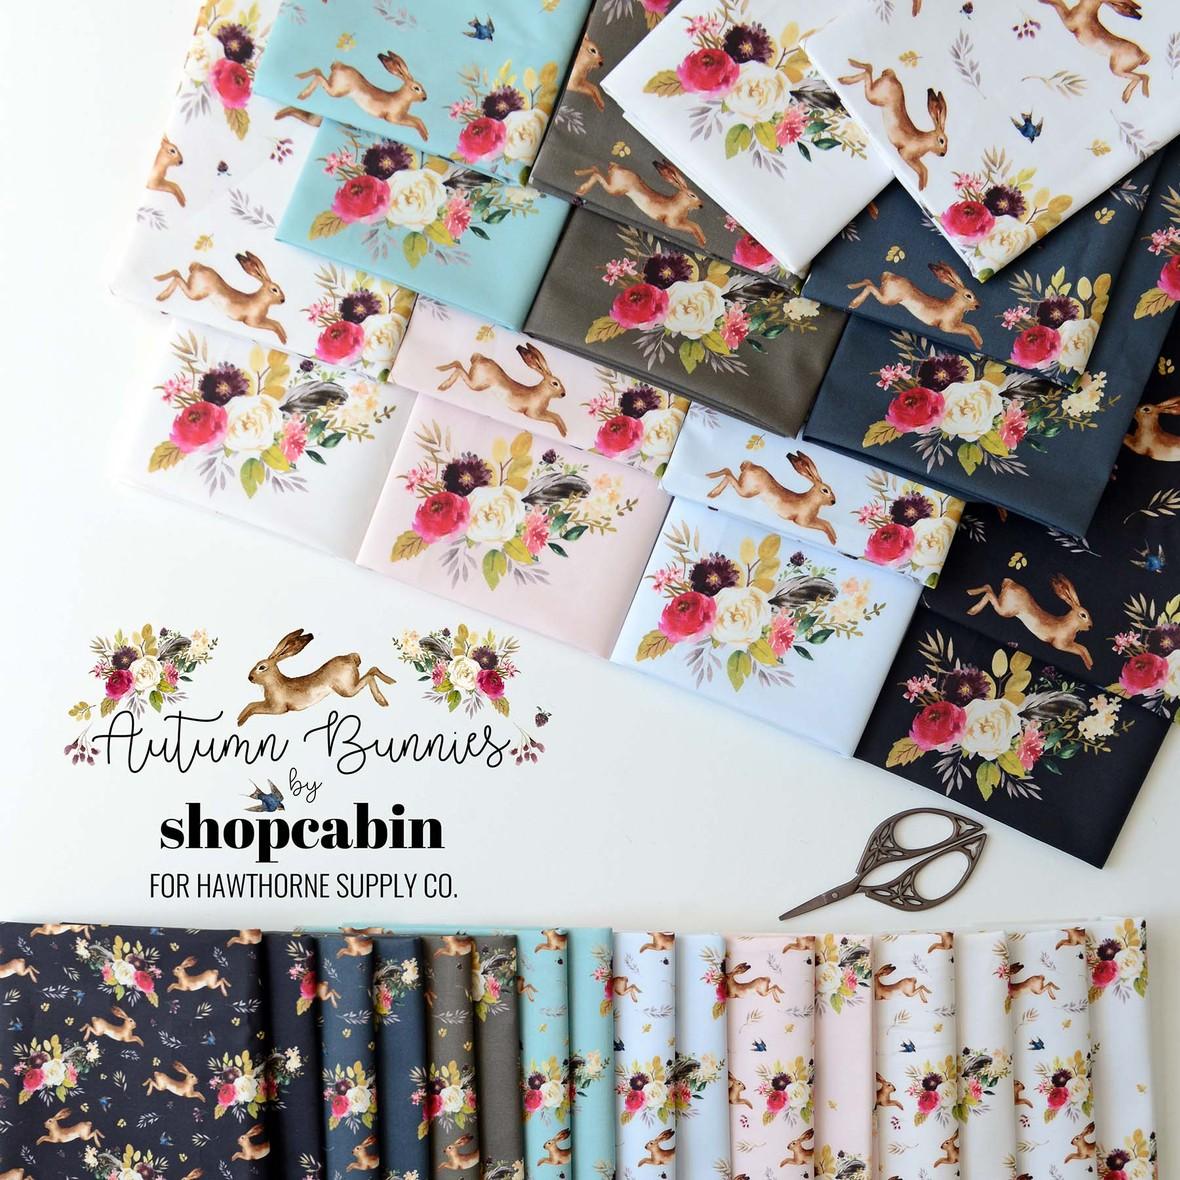 Autumn Bunnies Fabric Shopcabin for Hawthorne Supply Co